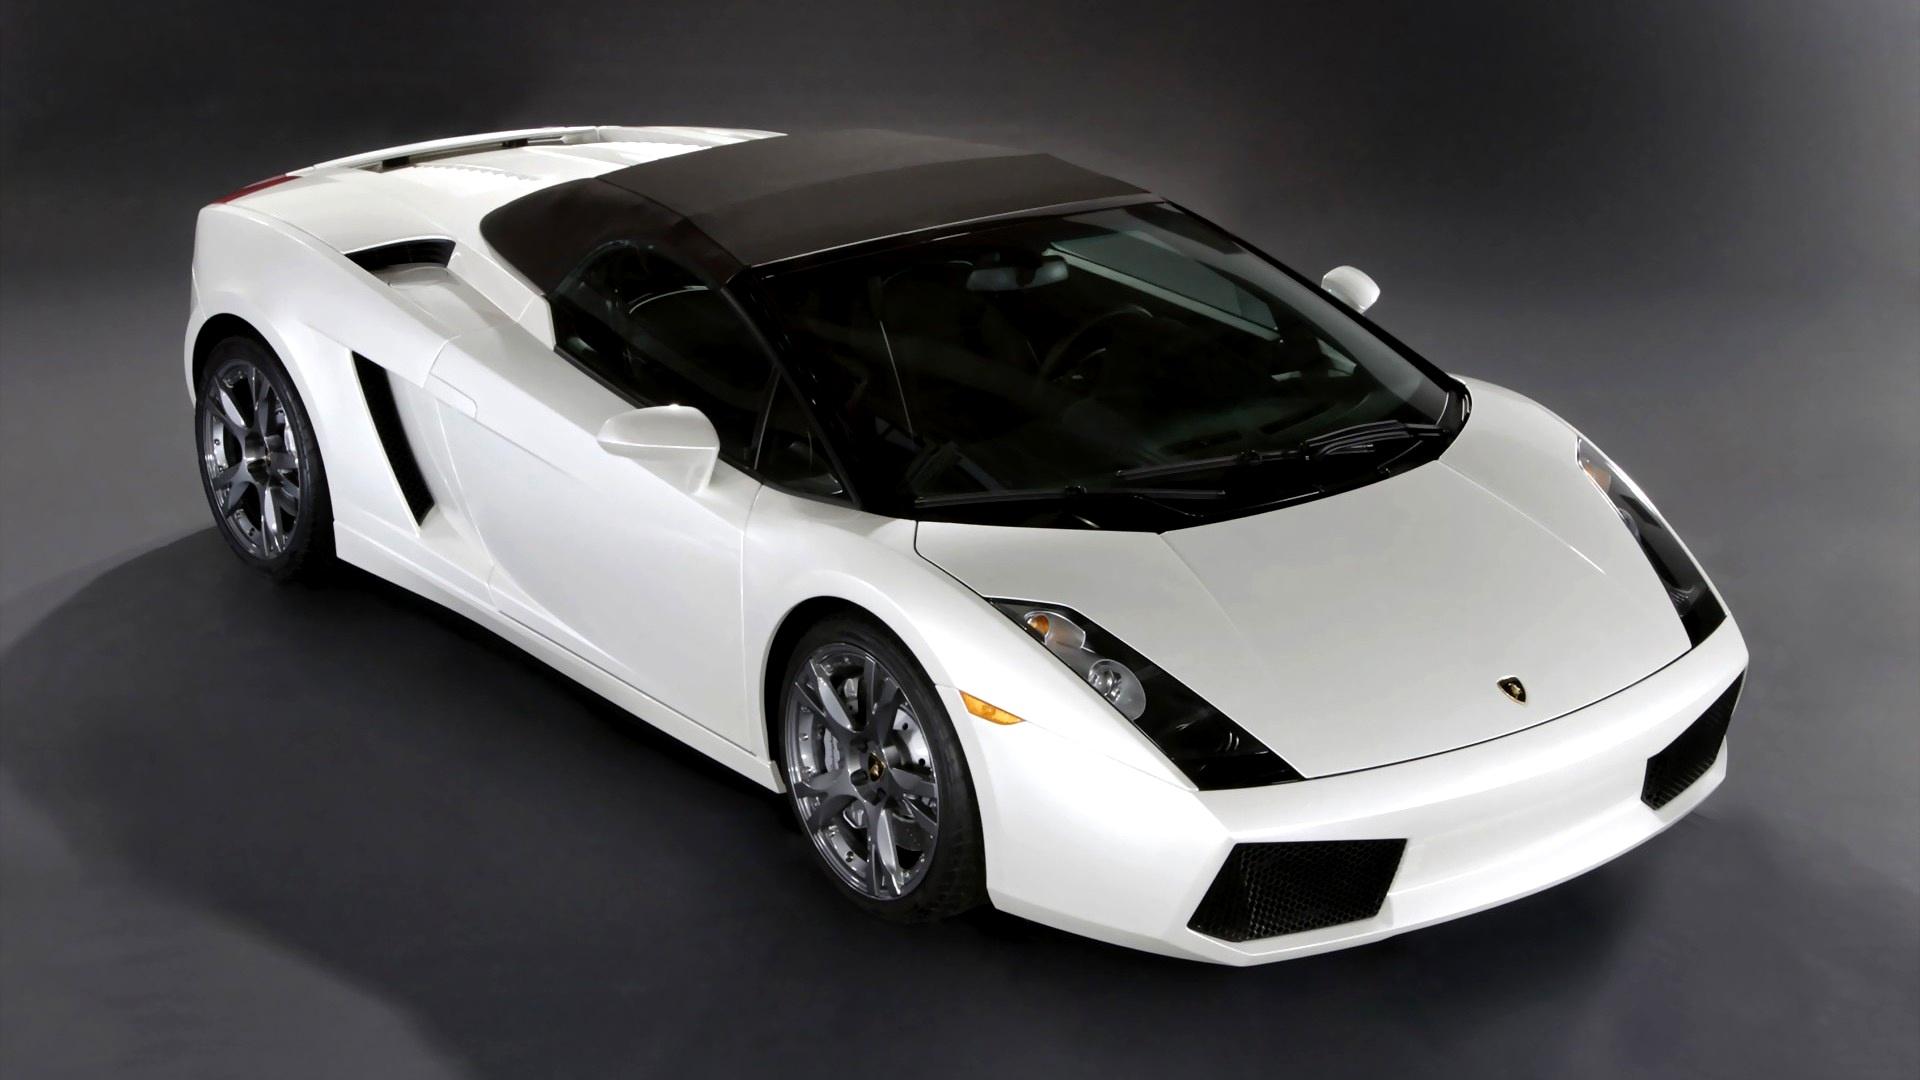 Lamborghini HD 1080p Wallpapers HD Wallpapers 1920x1080